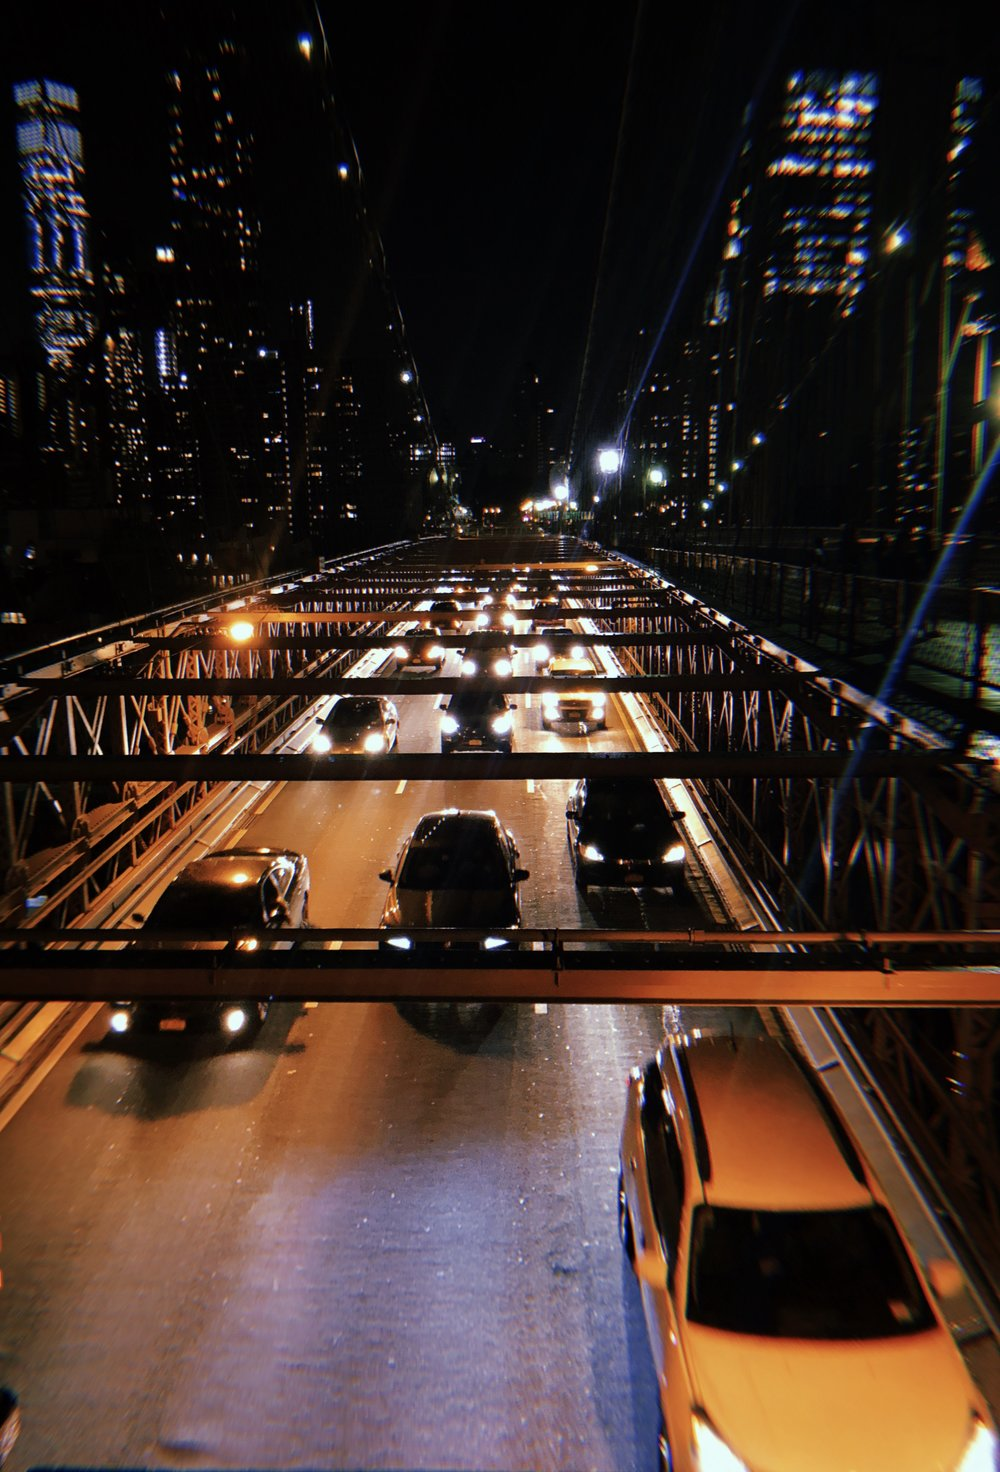 Ubers and Lyfts spotted on the Brooklyn Bridge at night.    Photo credit to Hannah Mallard